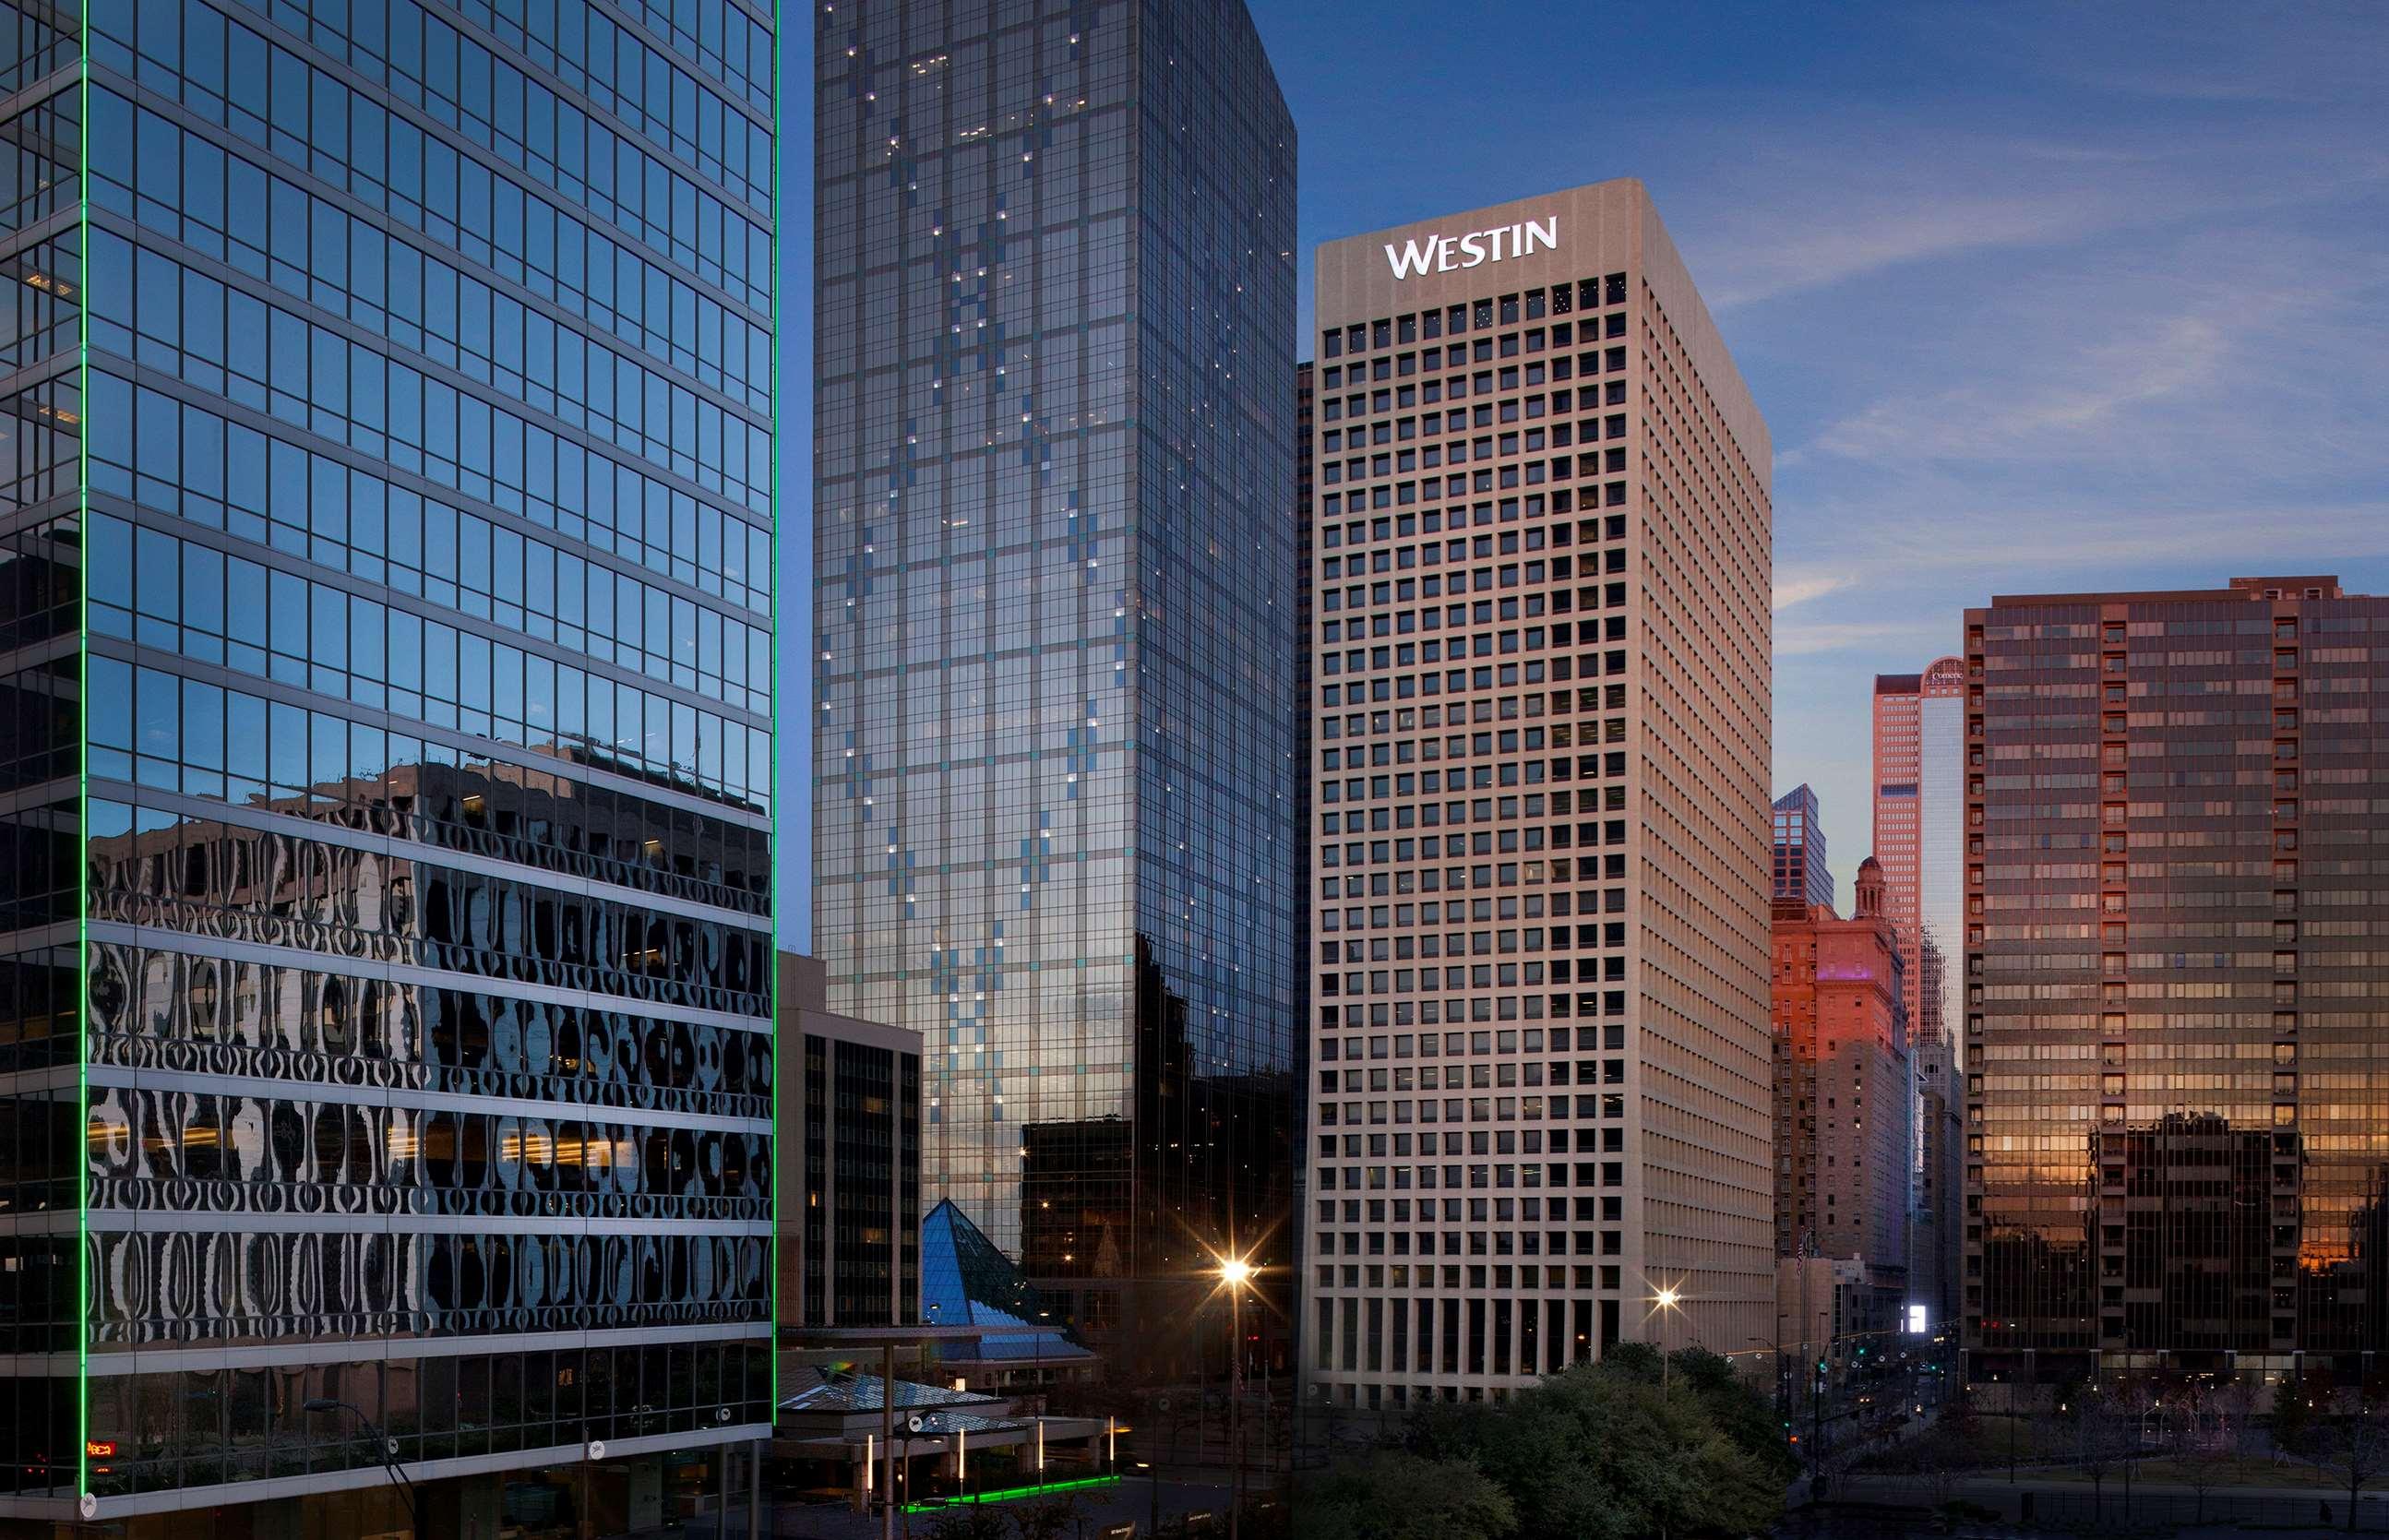 The Westin Dallas Downtown image 1